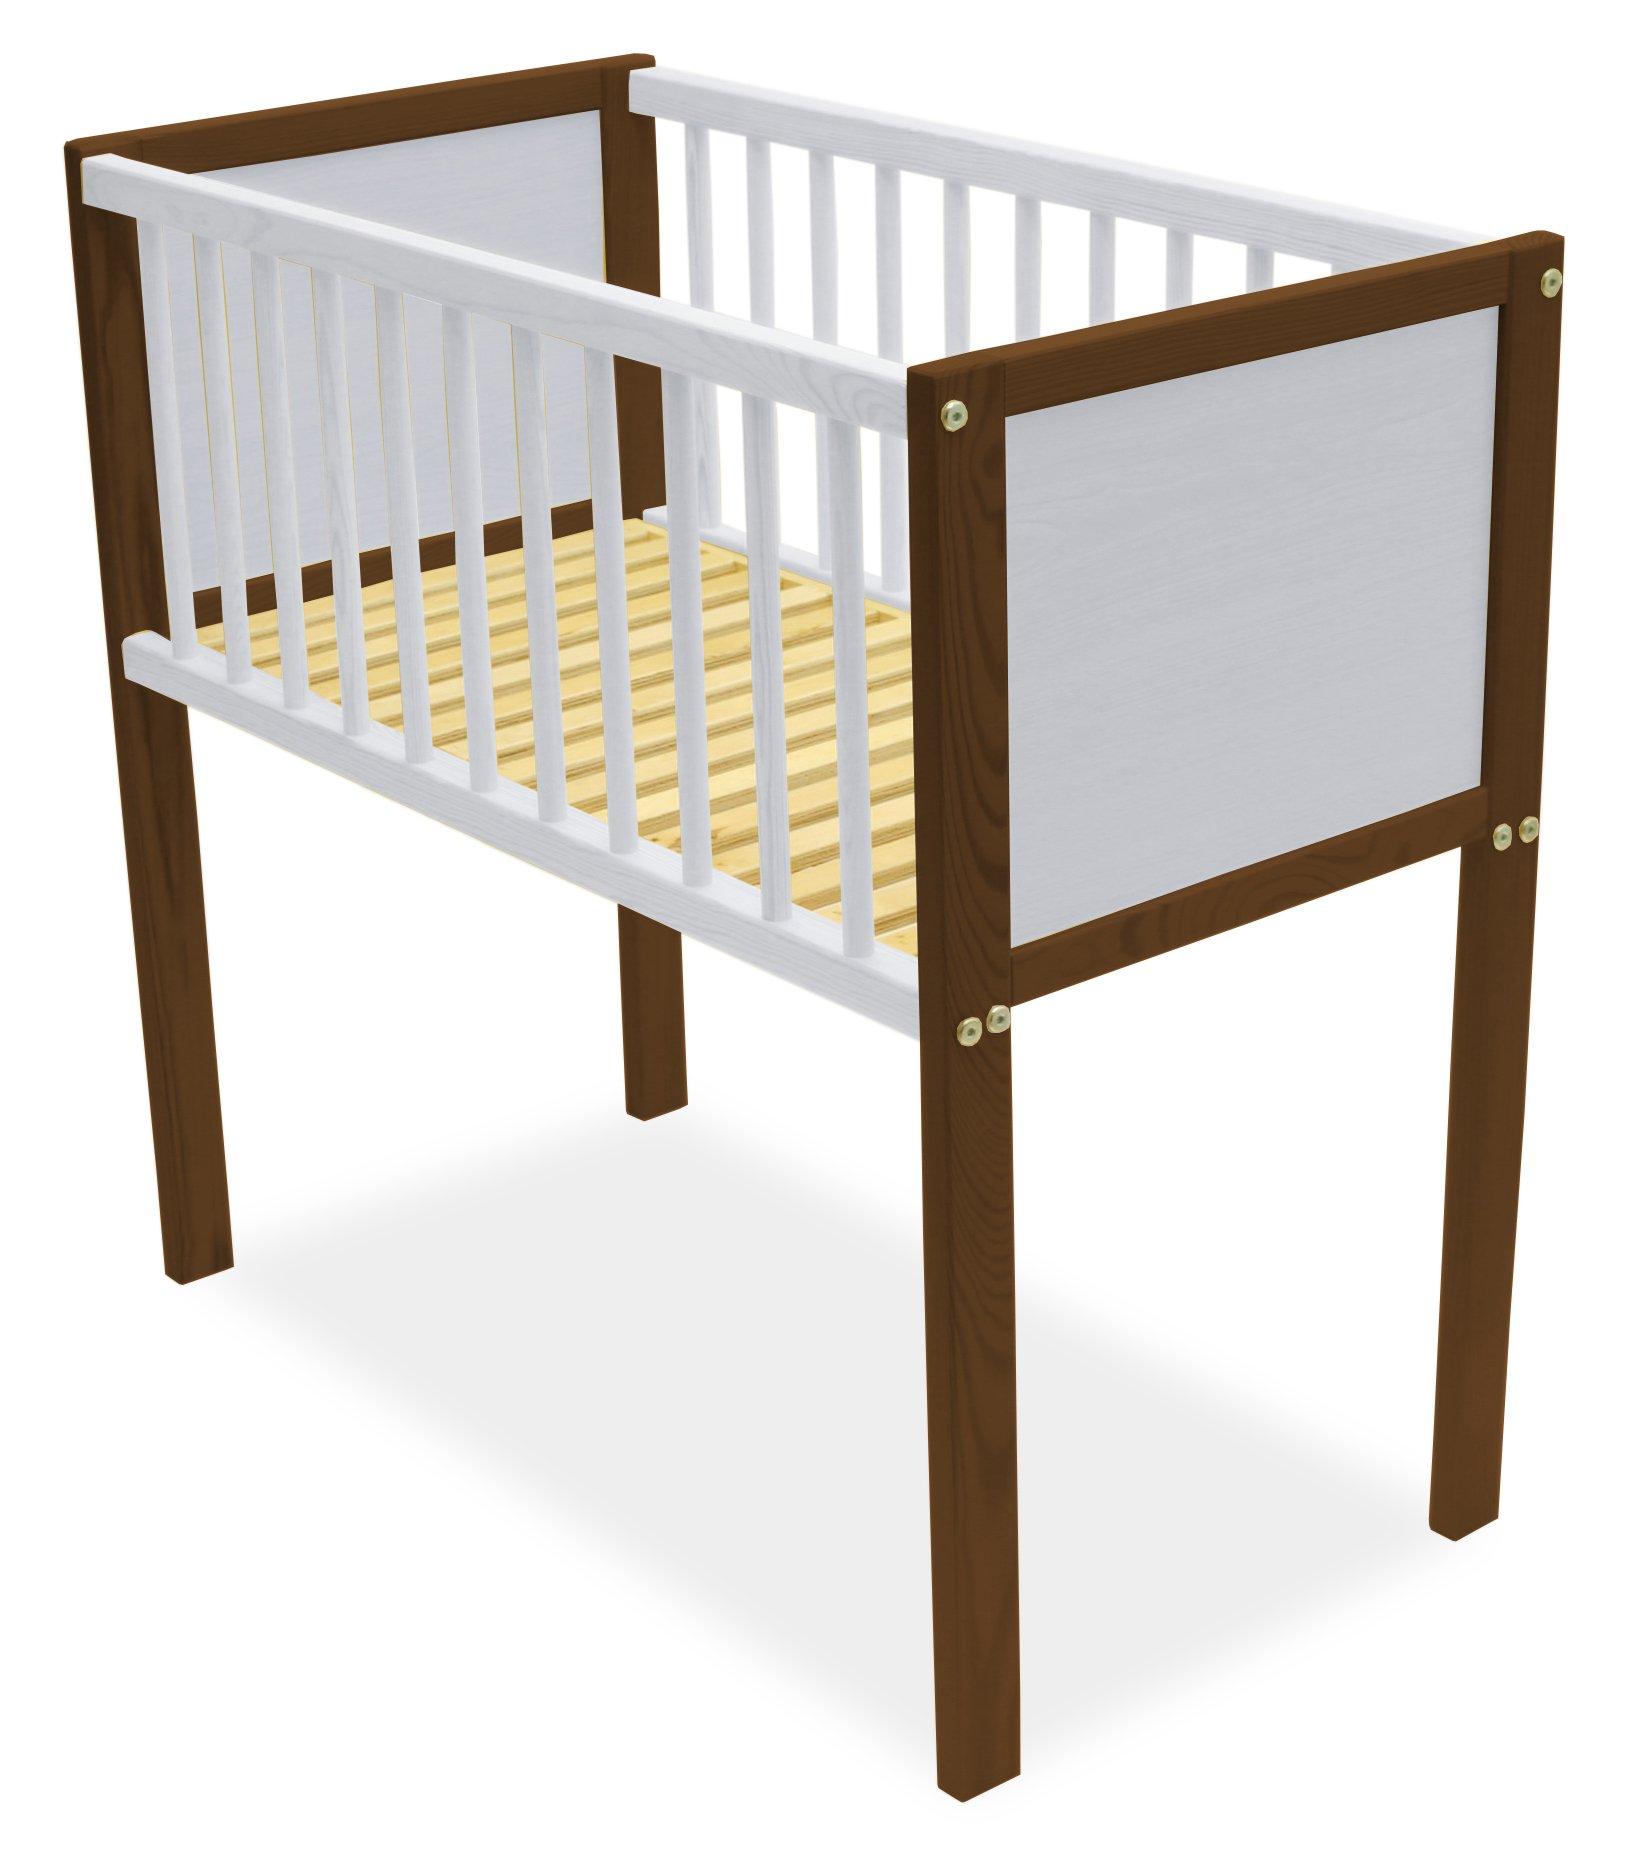 Grapi Mini Cot Bed with Mattress (Nut/Whitewash) Grapi  1